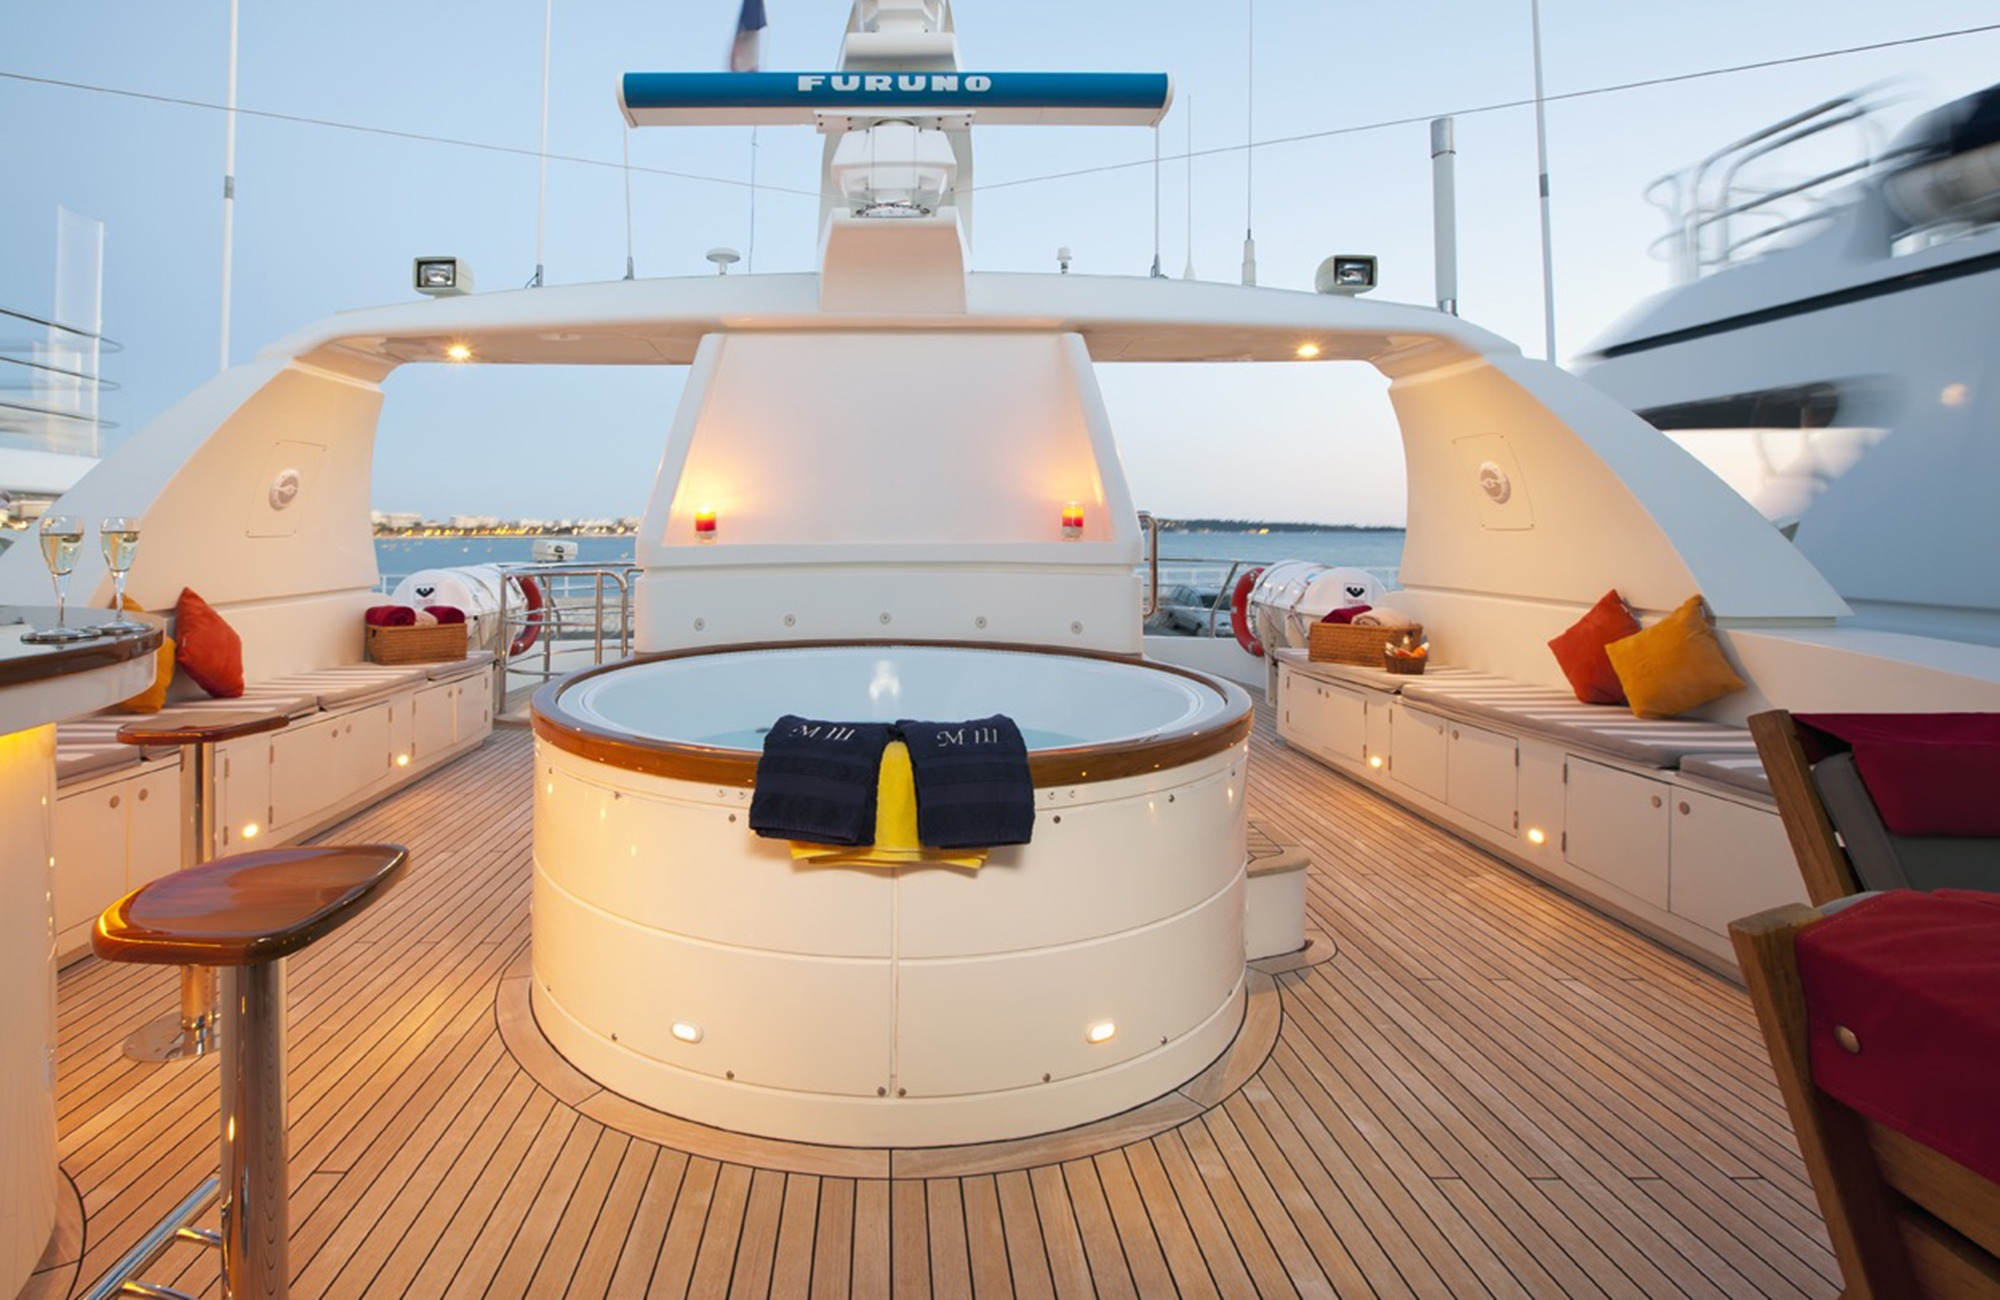 On-deck Jacuzzi